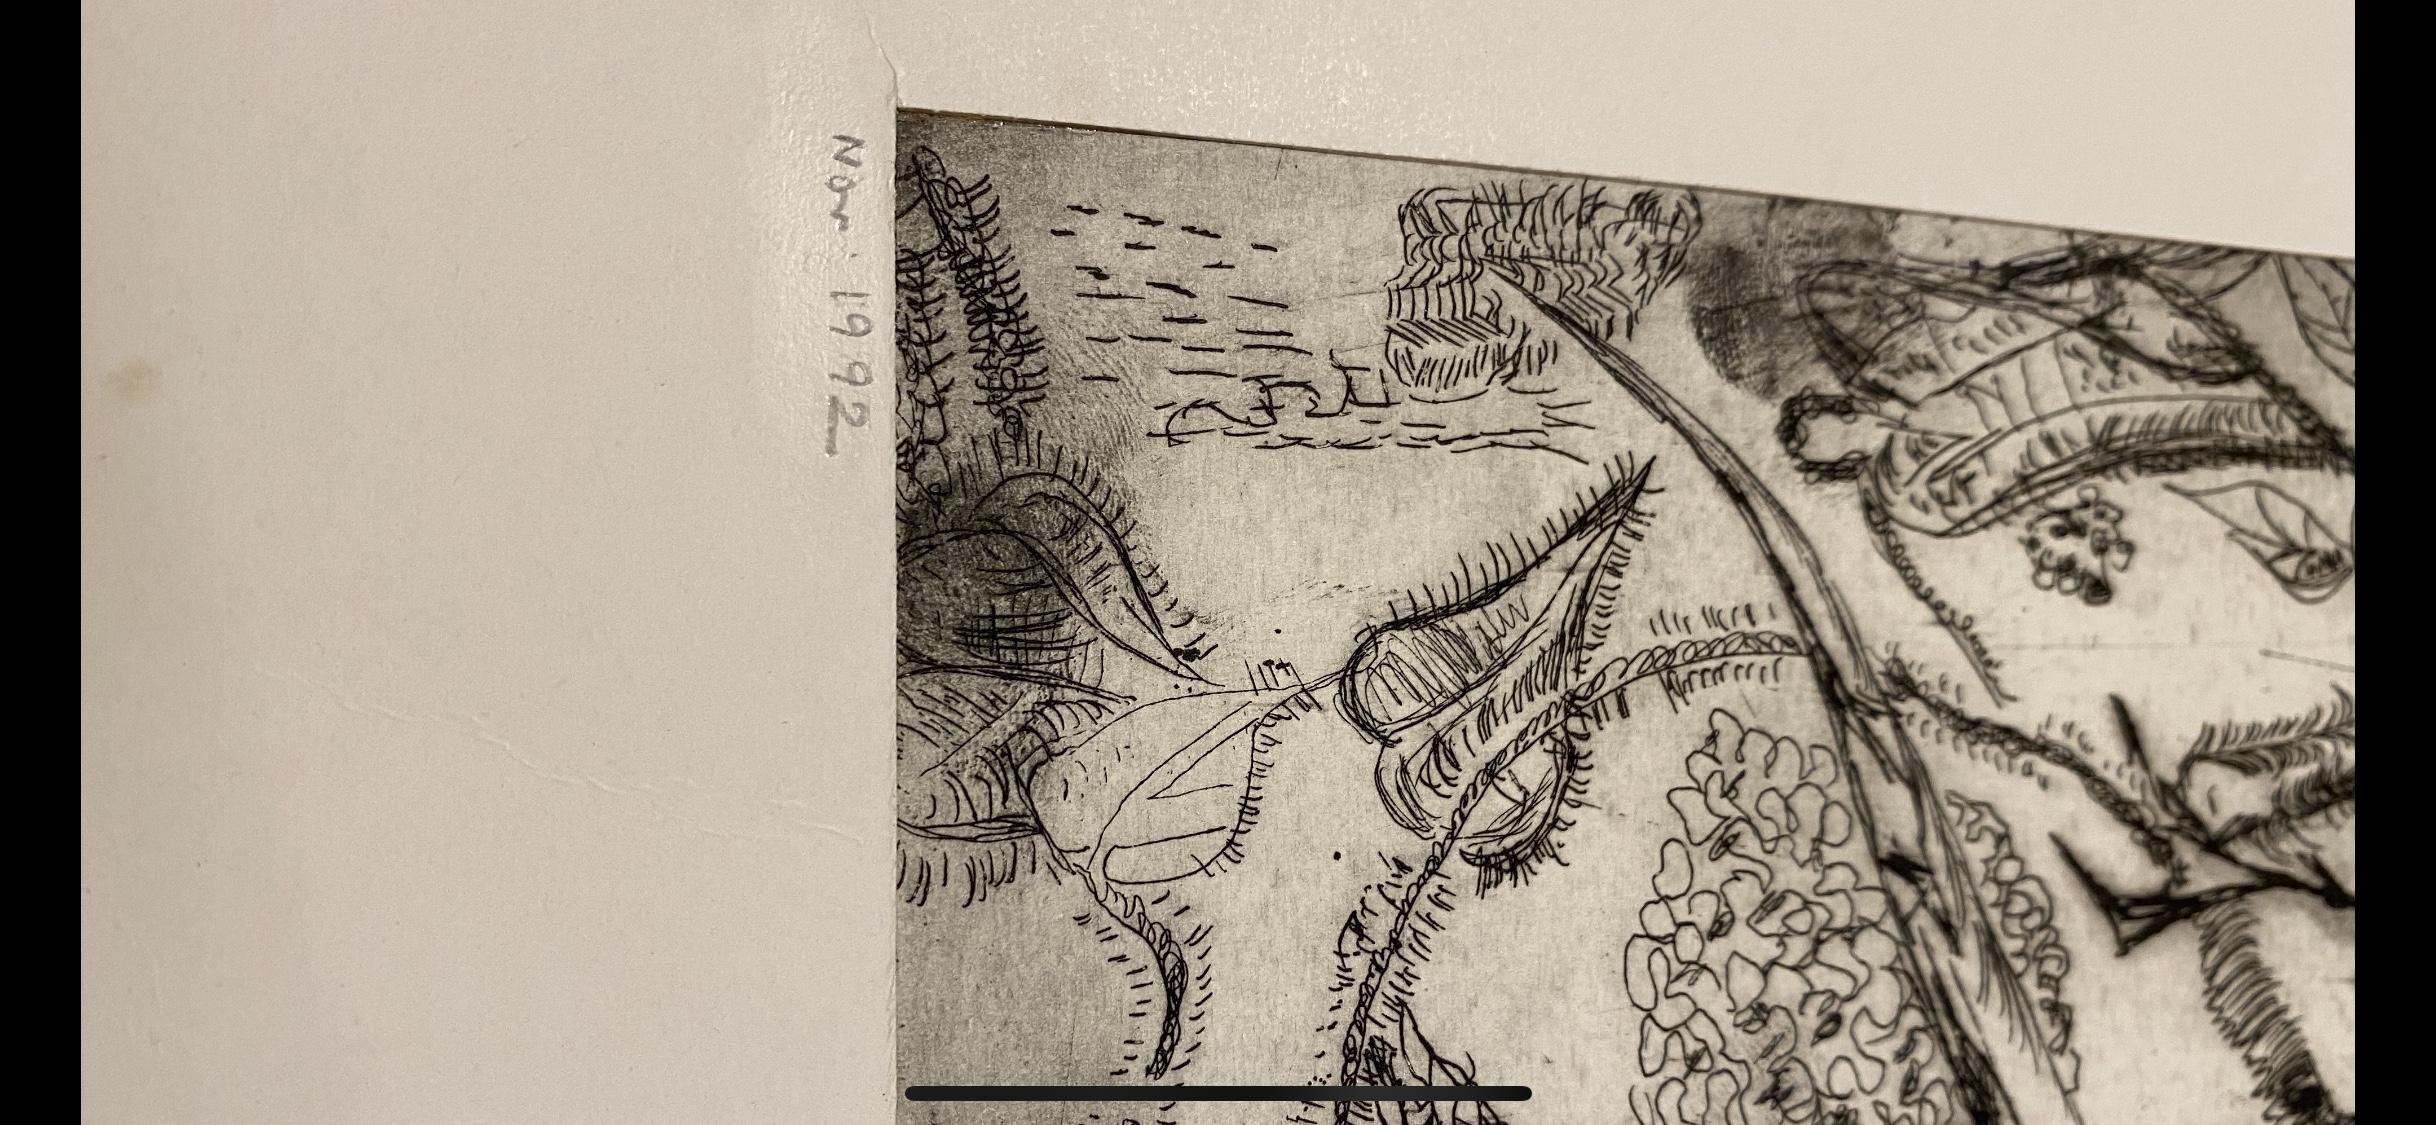 Samuel Robin Spark, Artist Proof `Print 92 - Image 3 of 4